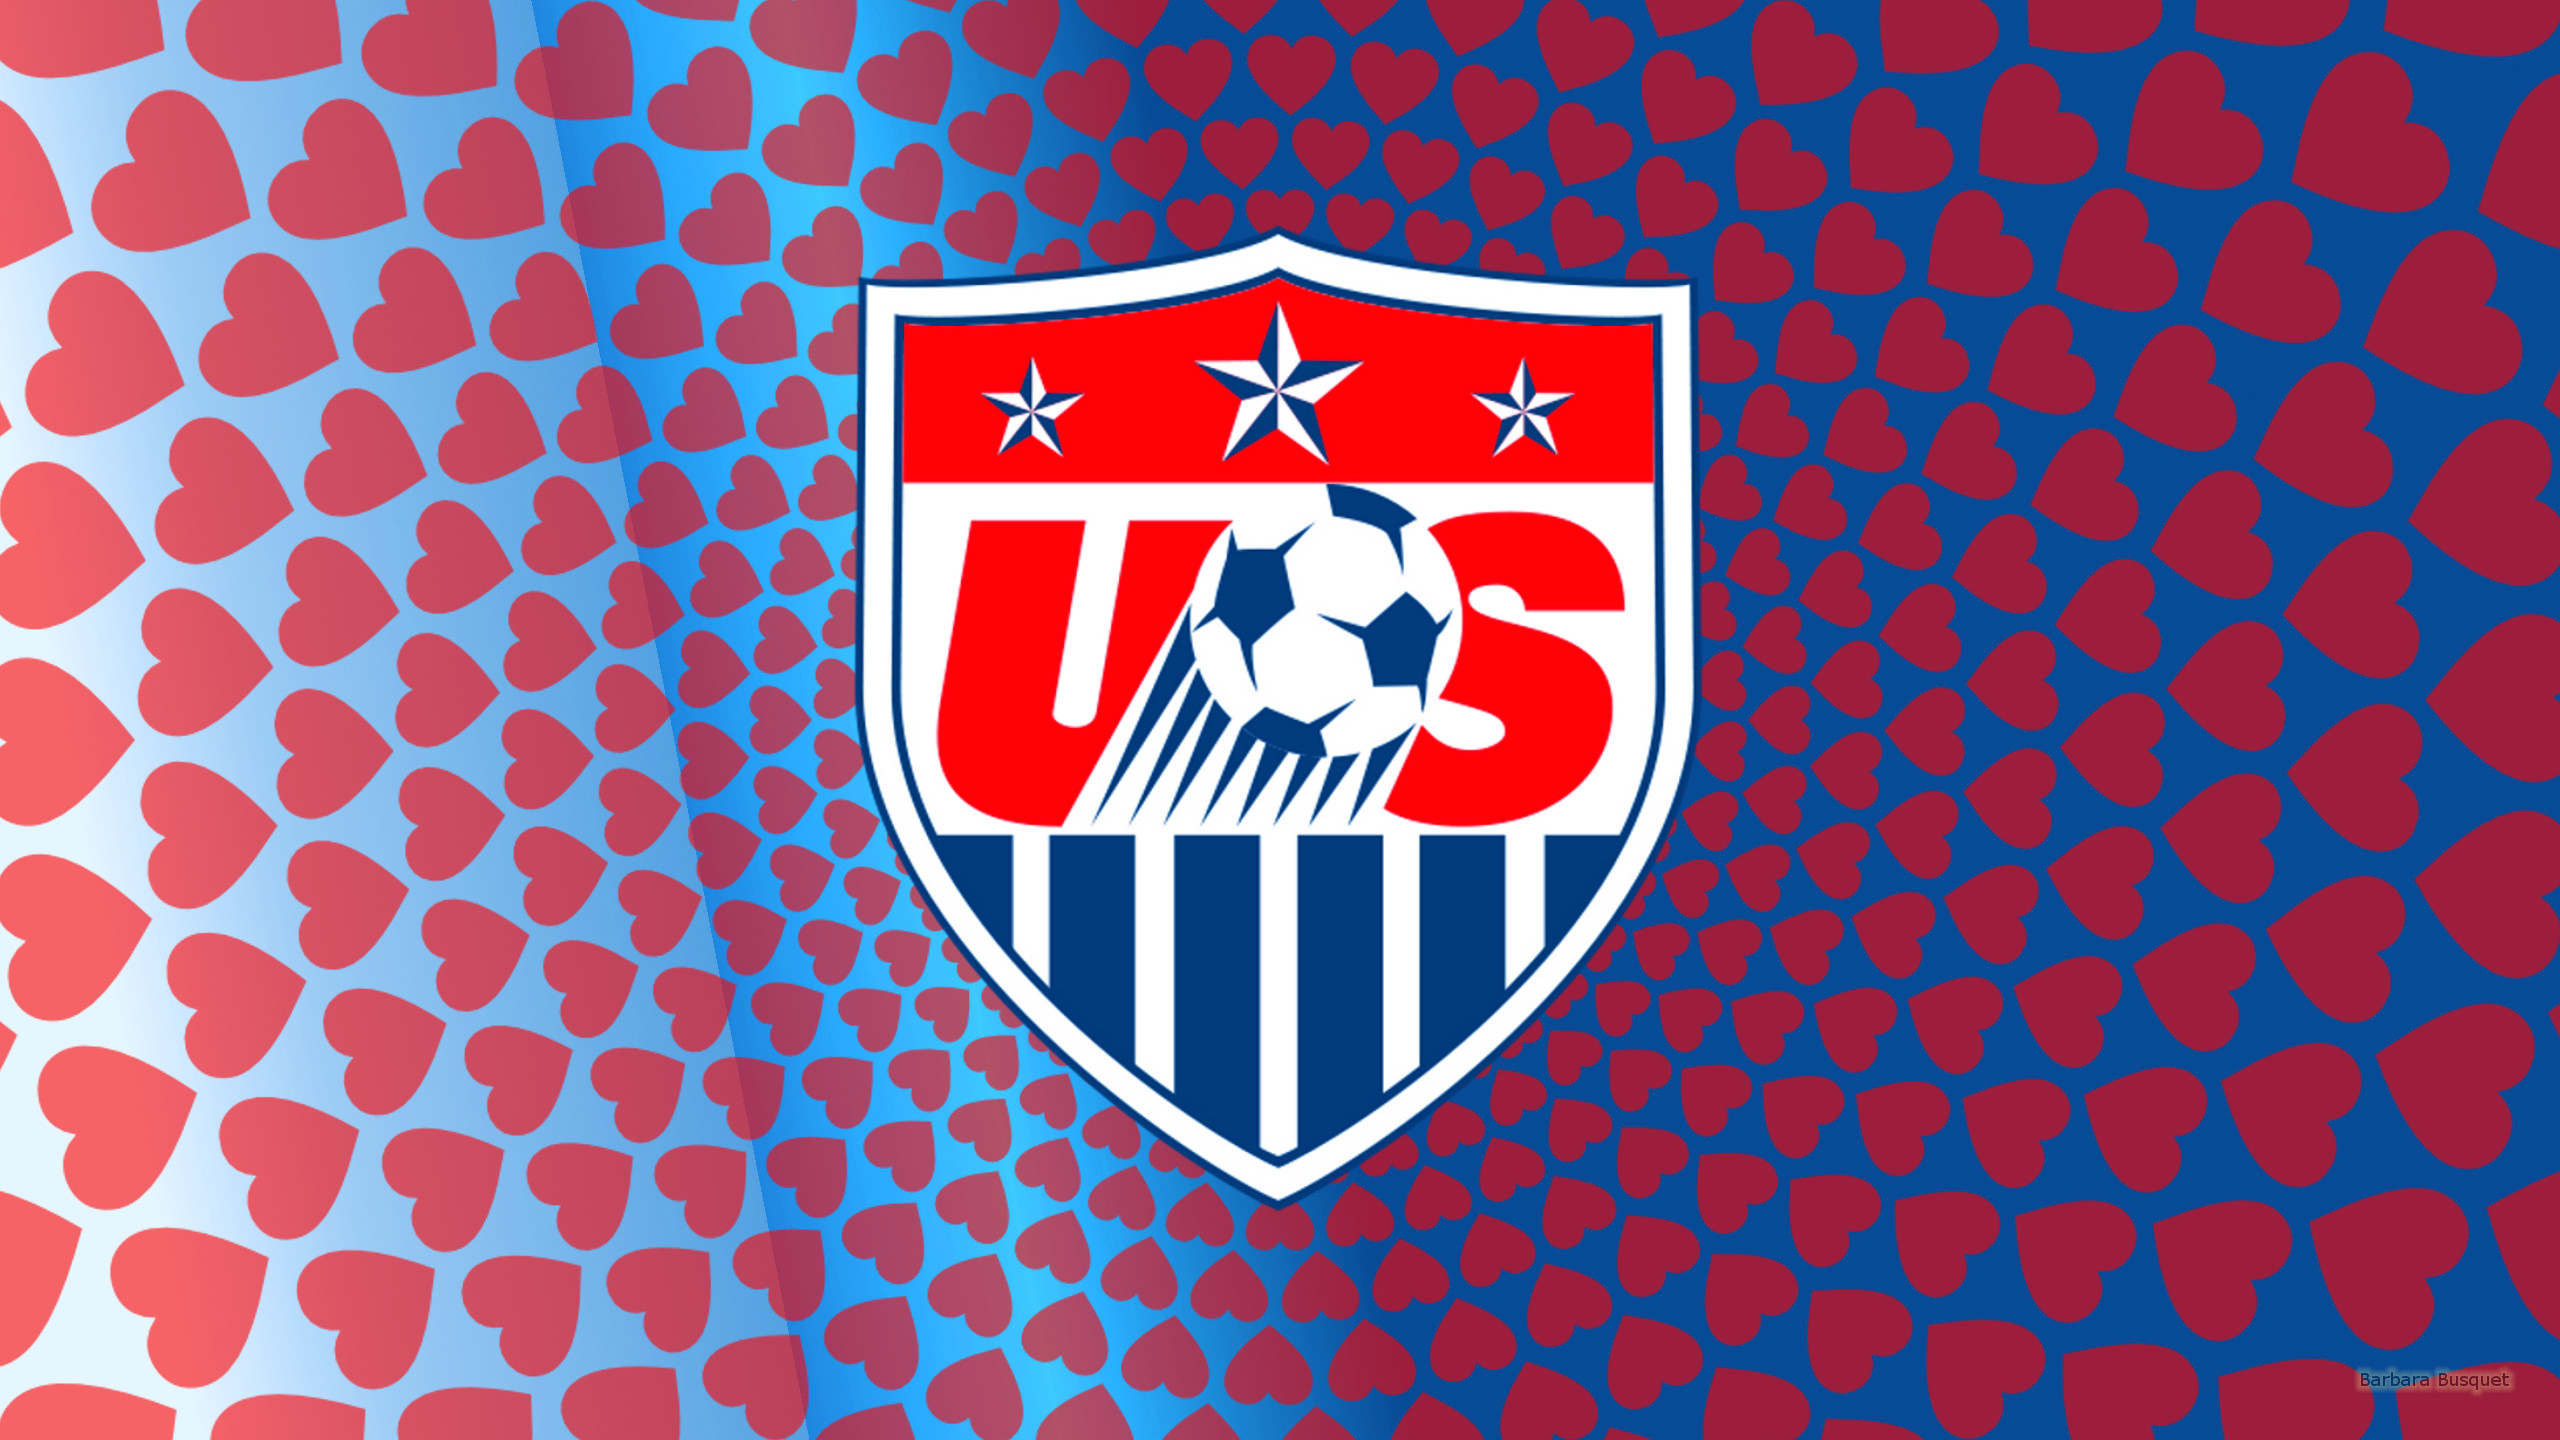 USA Soccer Wallpapers Barbaras HD Wallpapers 2560x1440